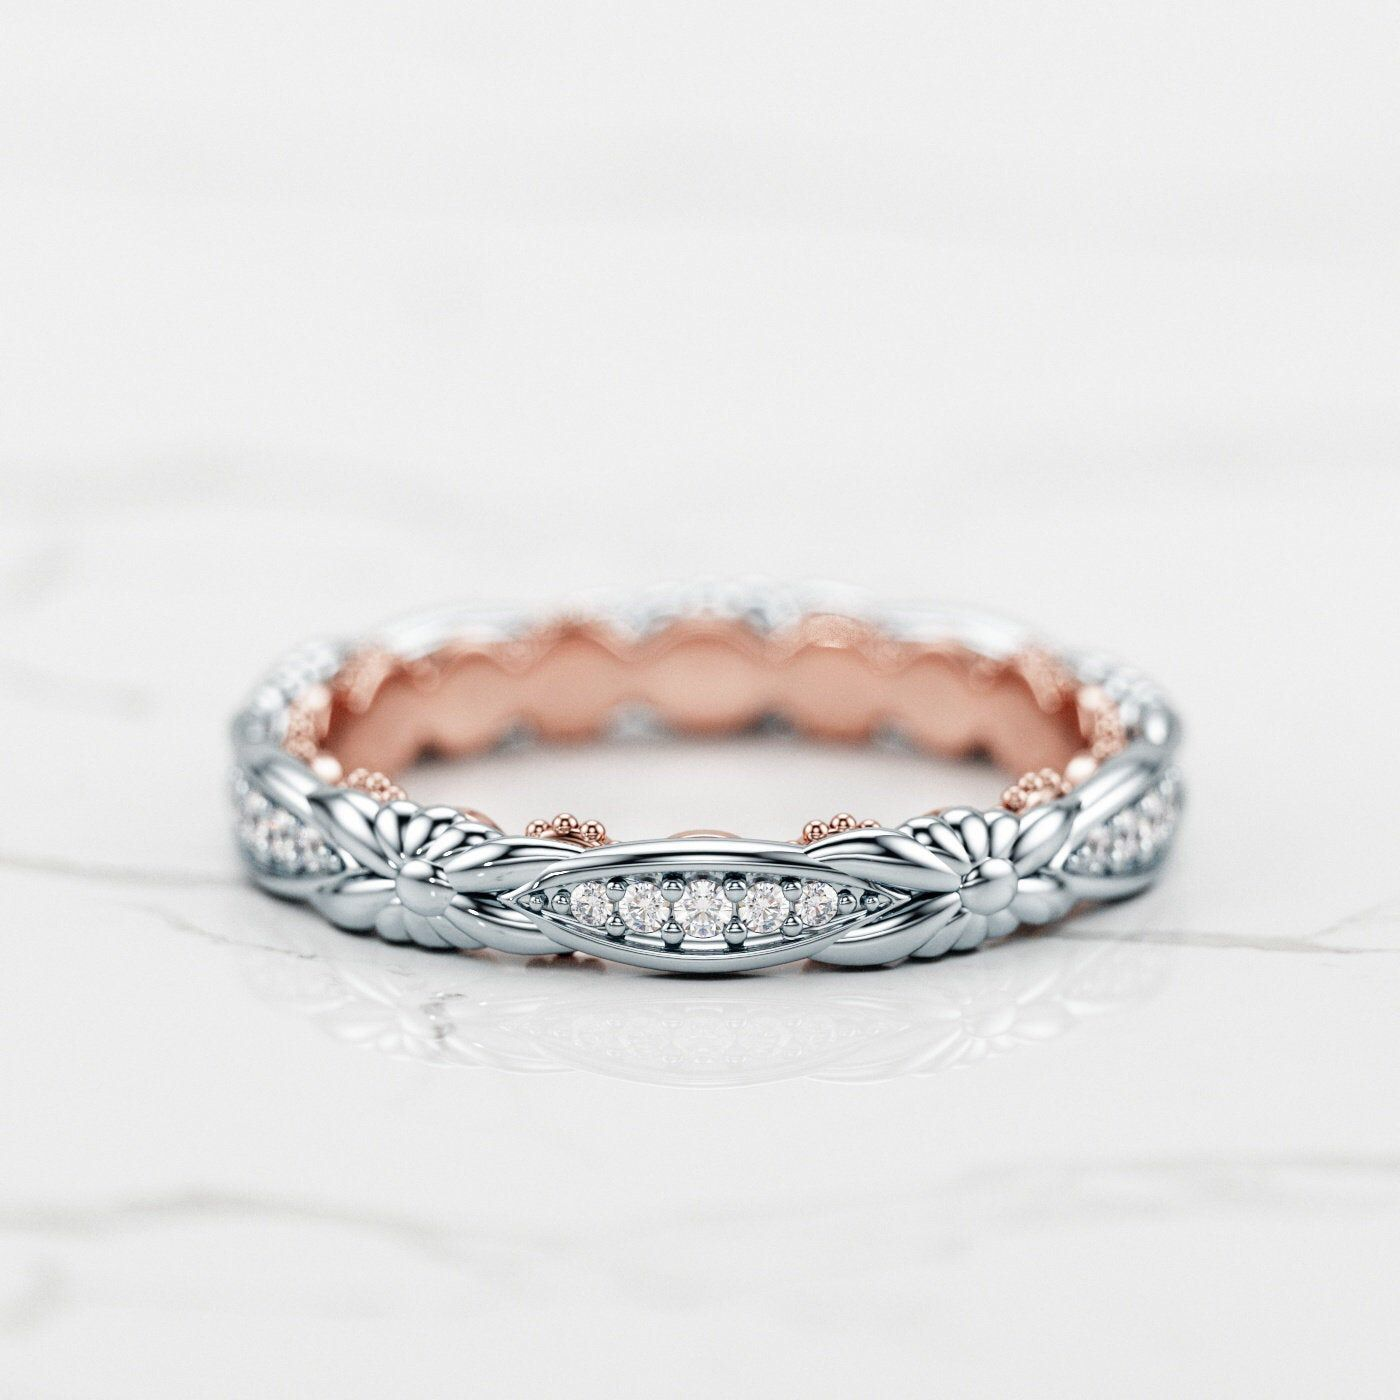 Braided Wedding Band / Two Tone Wedding Band / Diamond